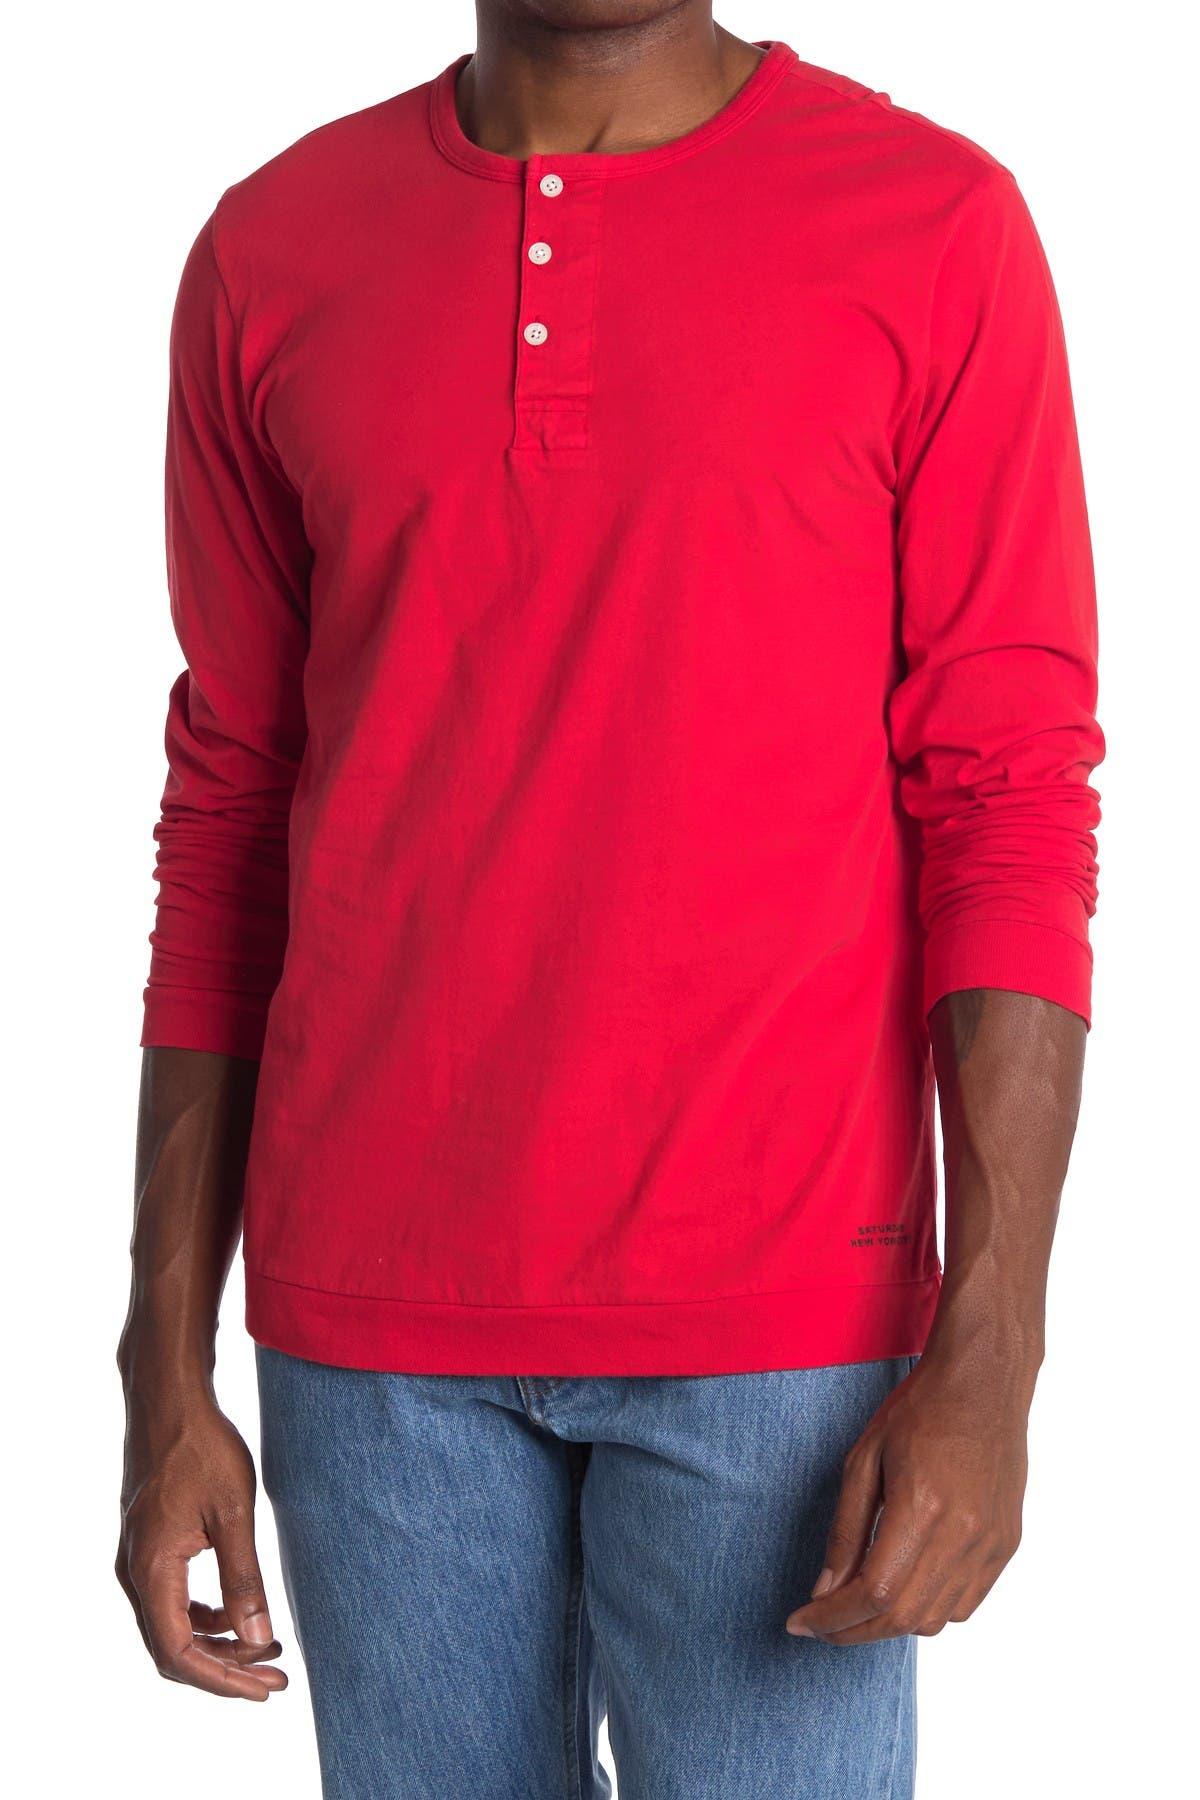 Image of SATURDAYS NYC Mitch Knit Henley T-Shirt